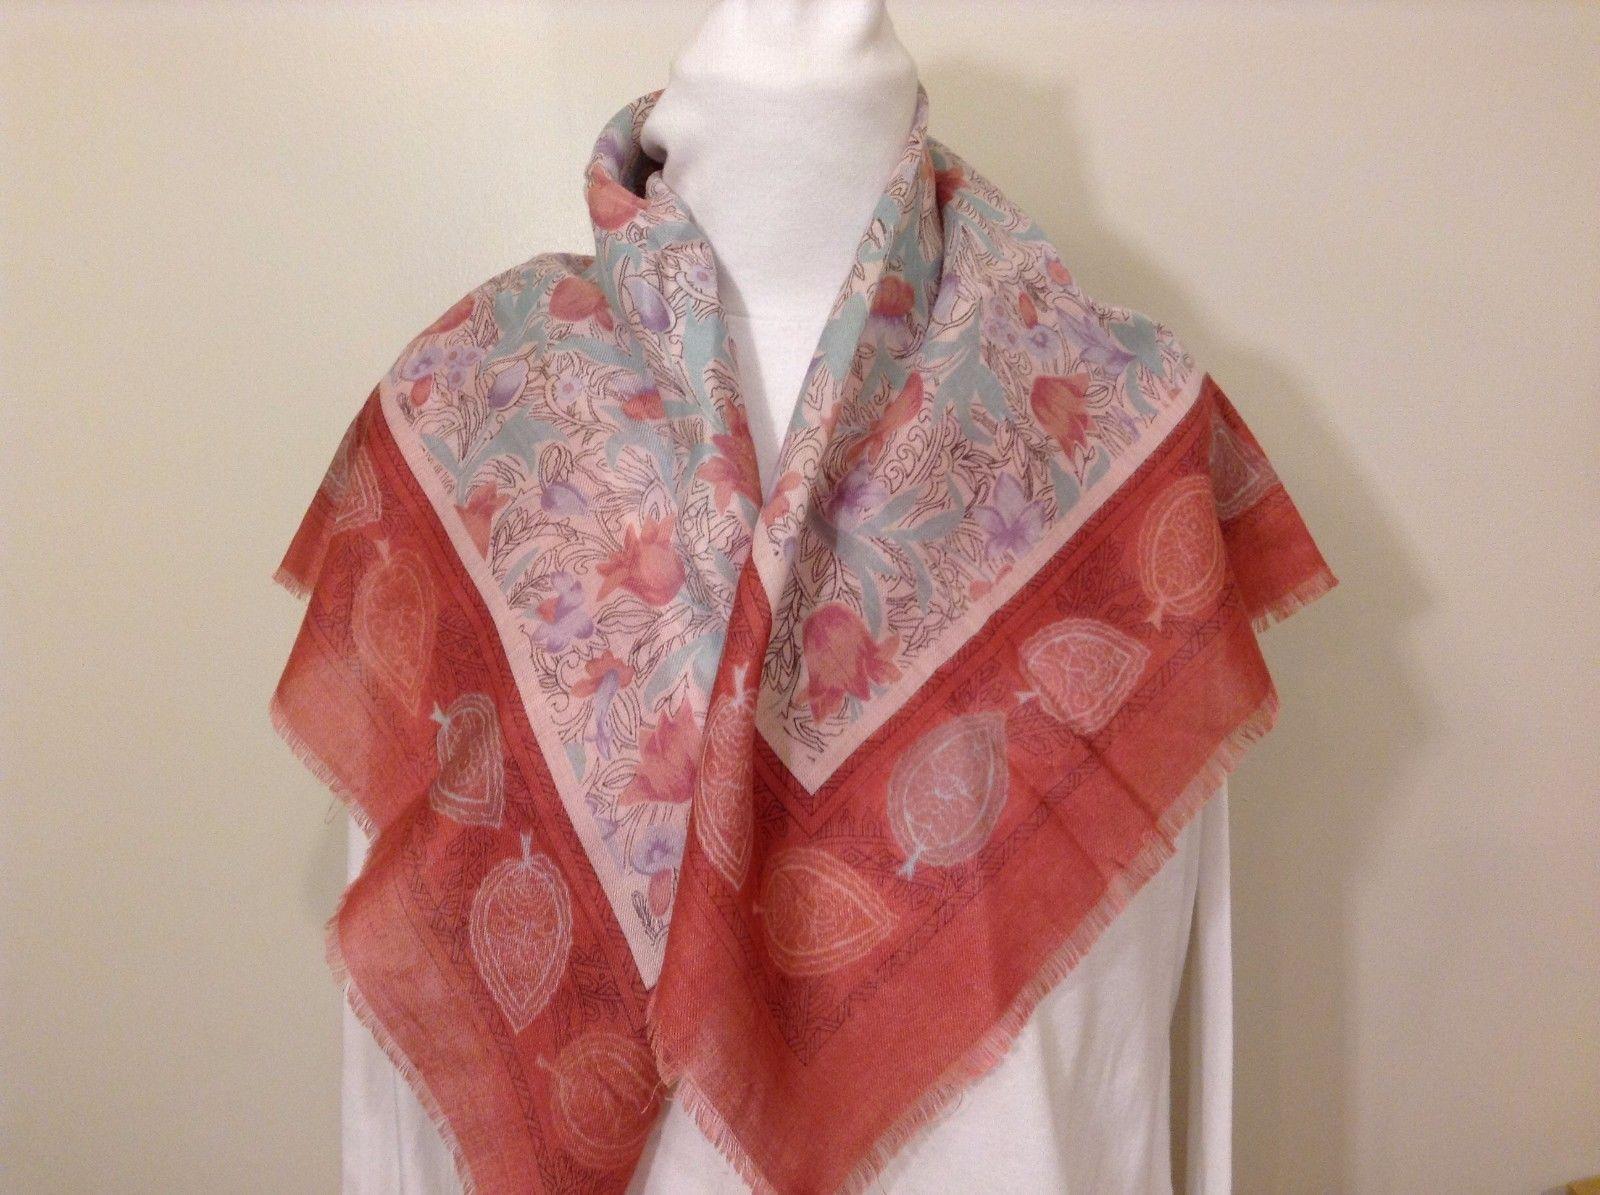 Vintage Japan Squares Floral Scarf Shawl Wrap Pinkish Red Turquoise Purple